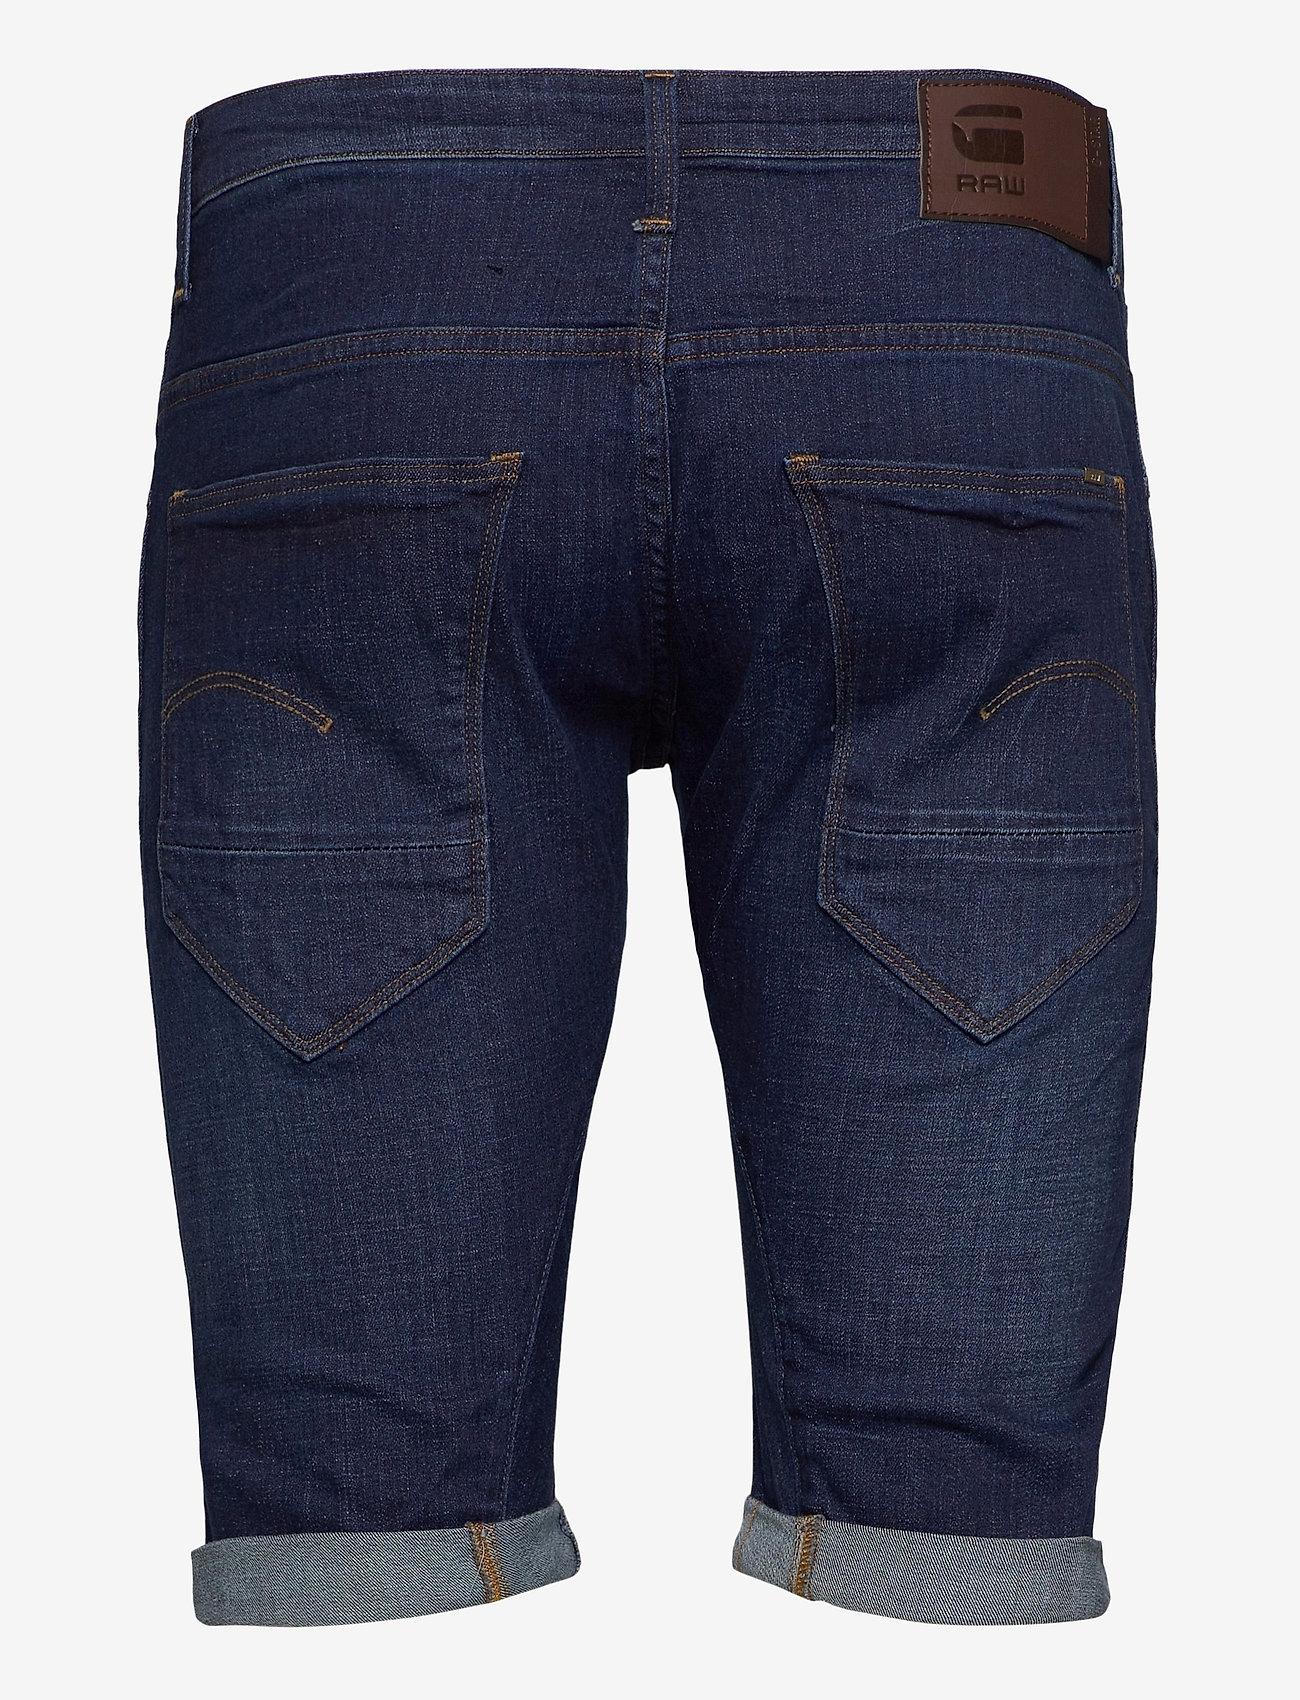 G-star RAW - Arc 3D 1\2 custom - denim shorts - dk aged - 1